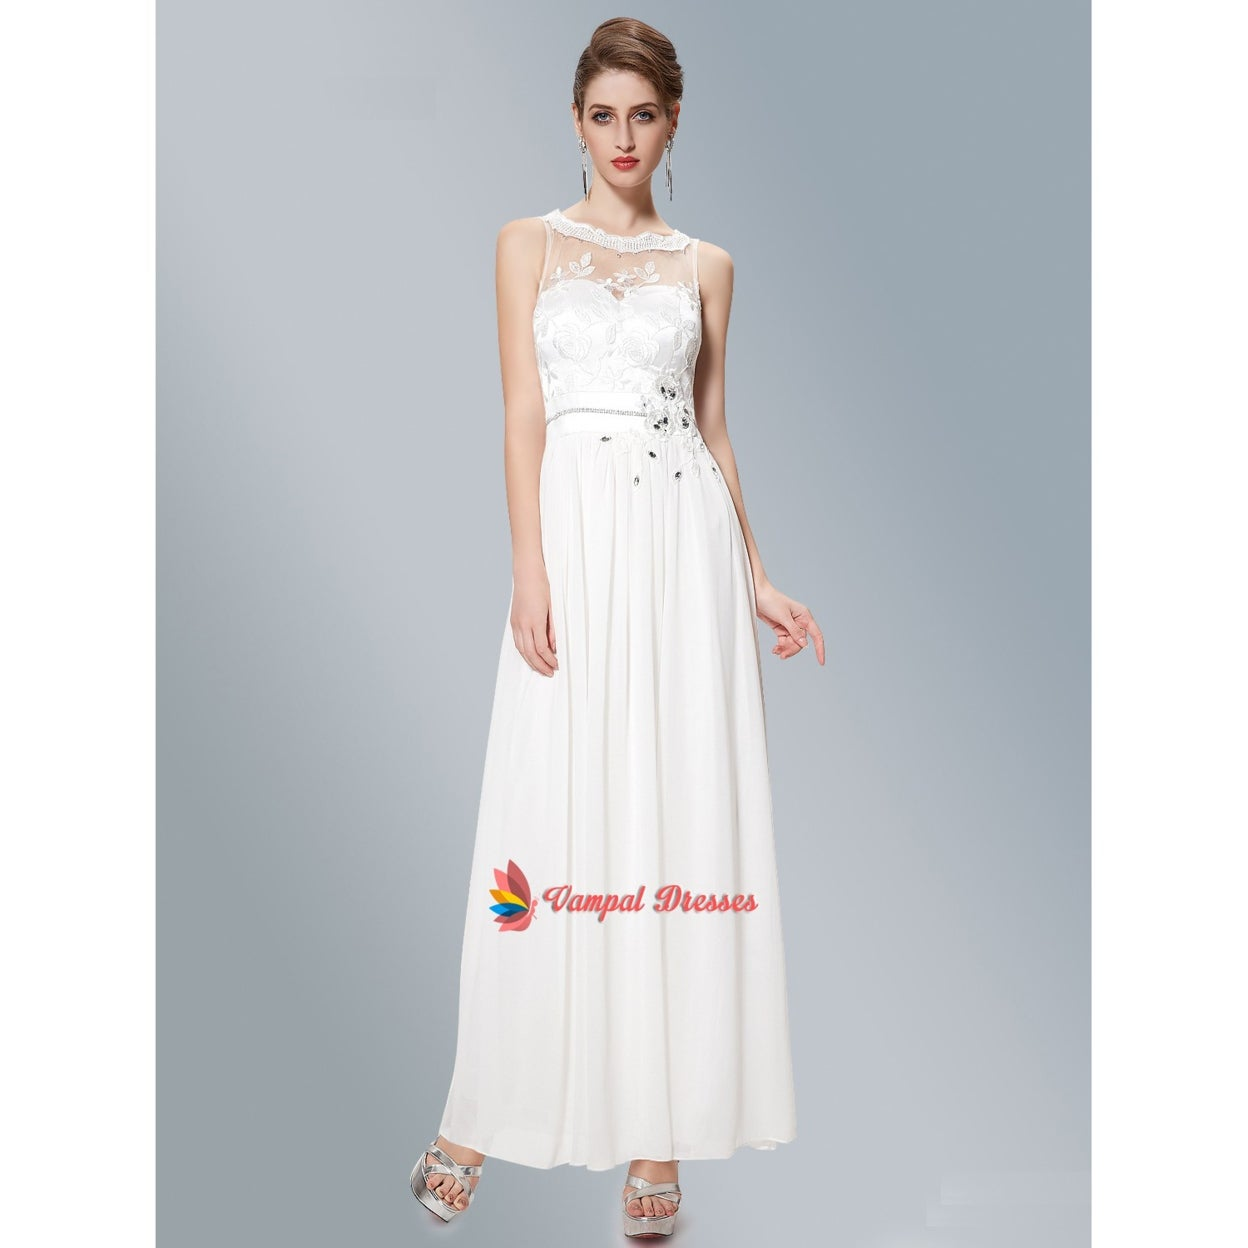 45f9ef845ddd Shop White Illusion Neckline Long Chiffon Prom Dress With Embroidery ...